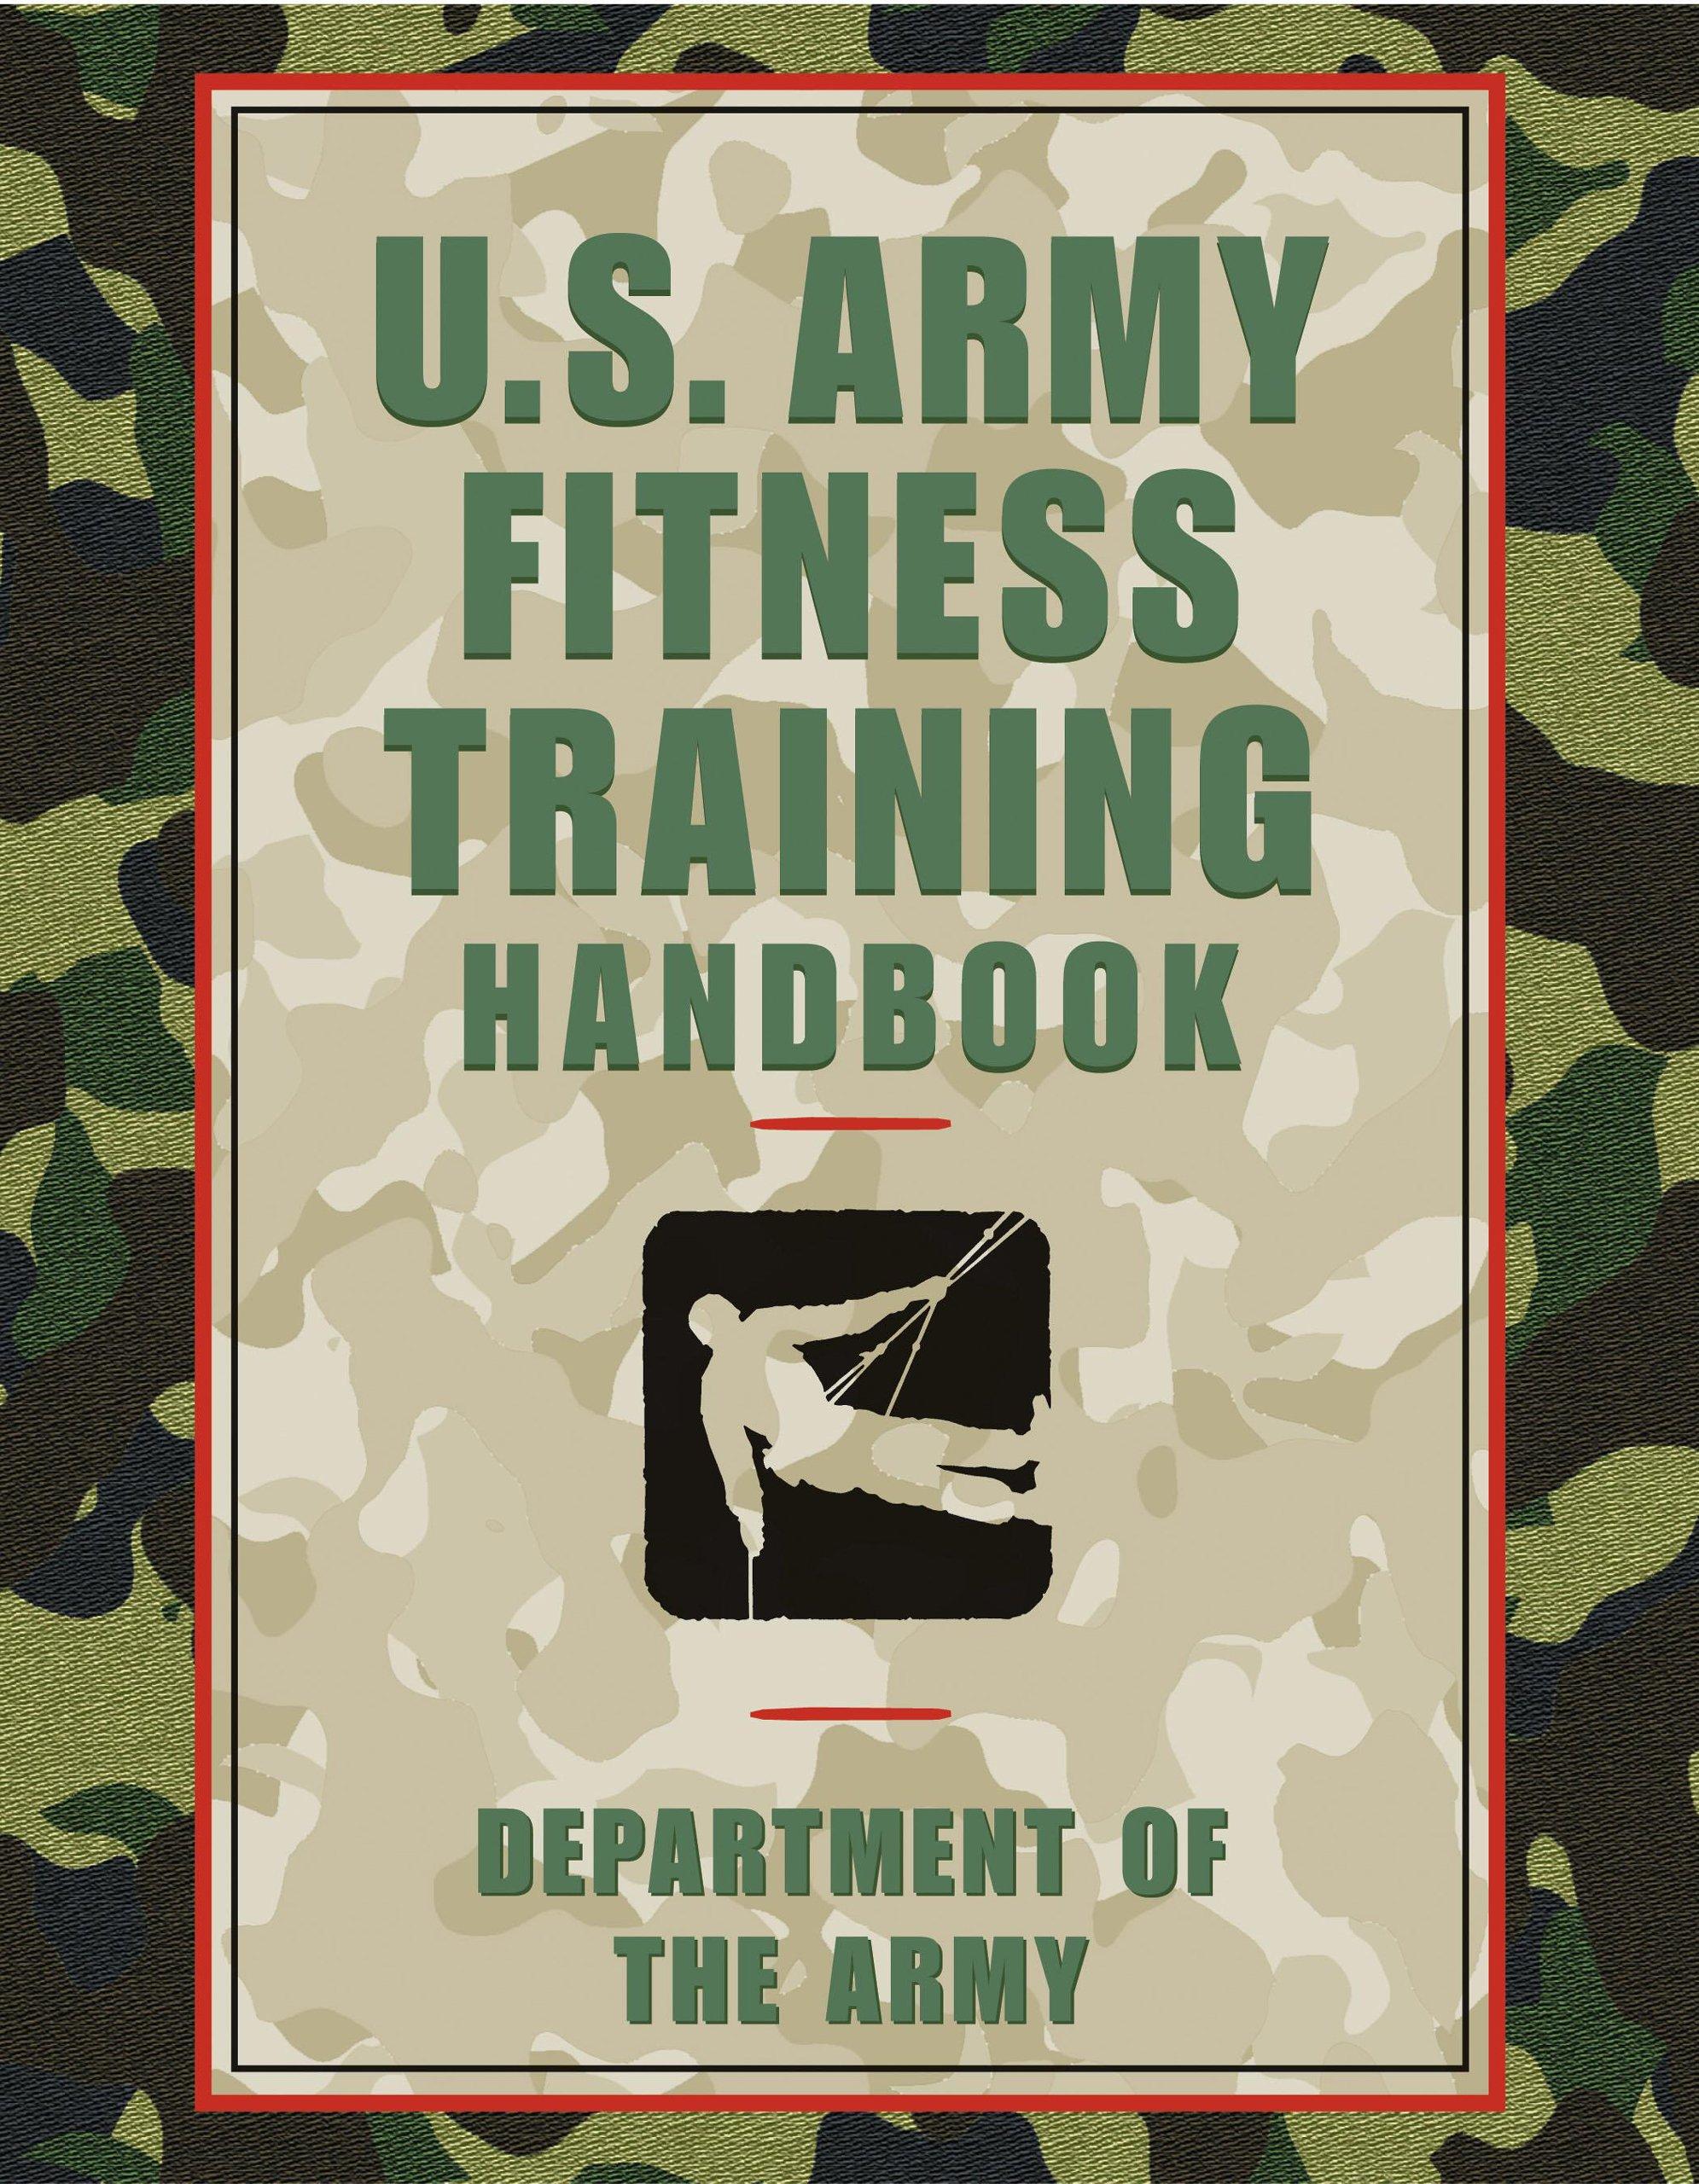 U.S. Army Fitness Training Handbook: Department of the Army: 9781585748556:  Amazon.com: Books